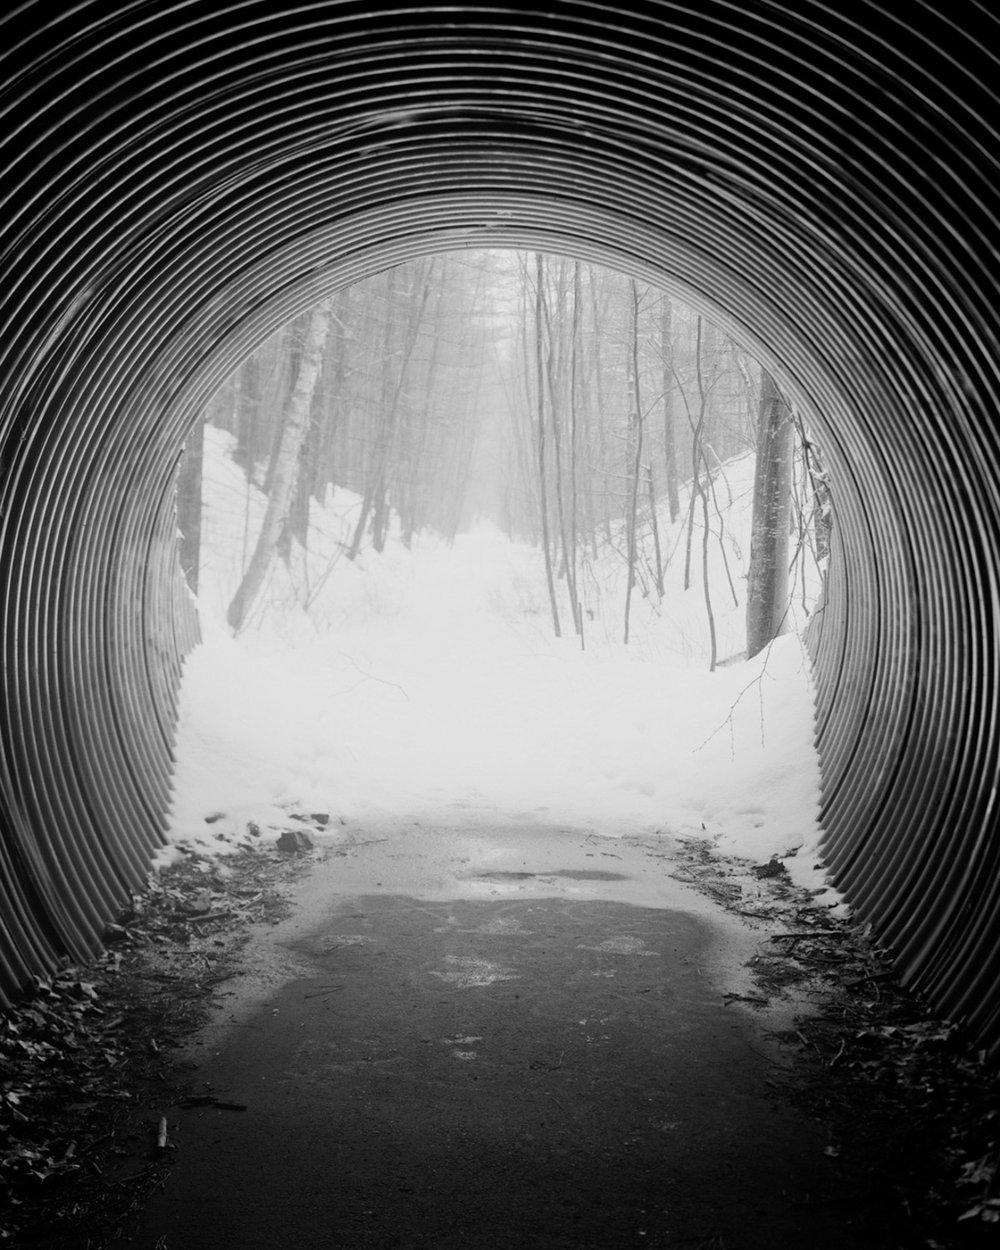 Underpass, 2013